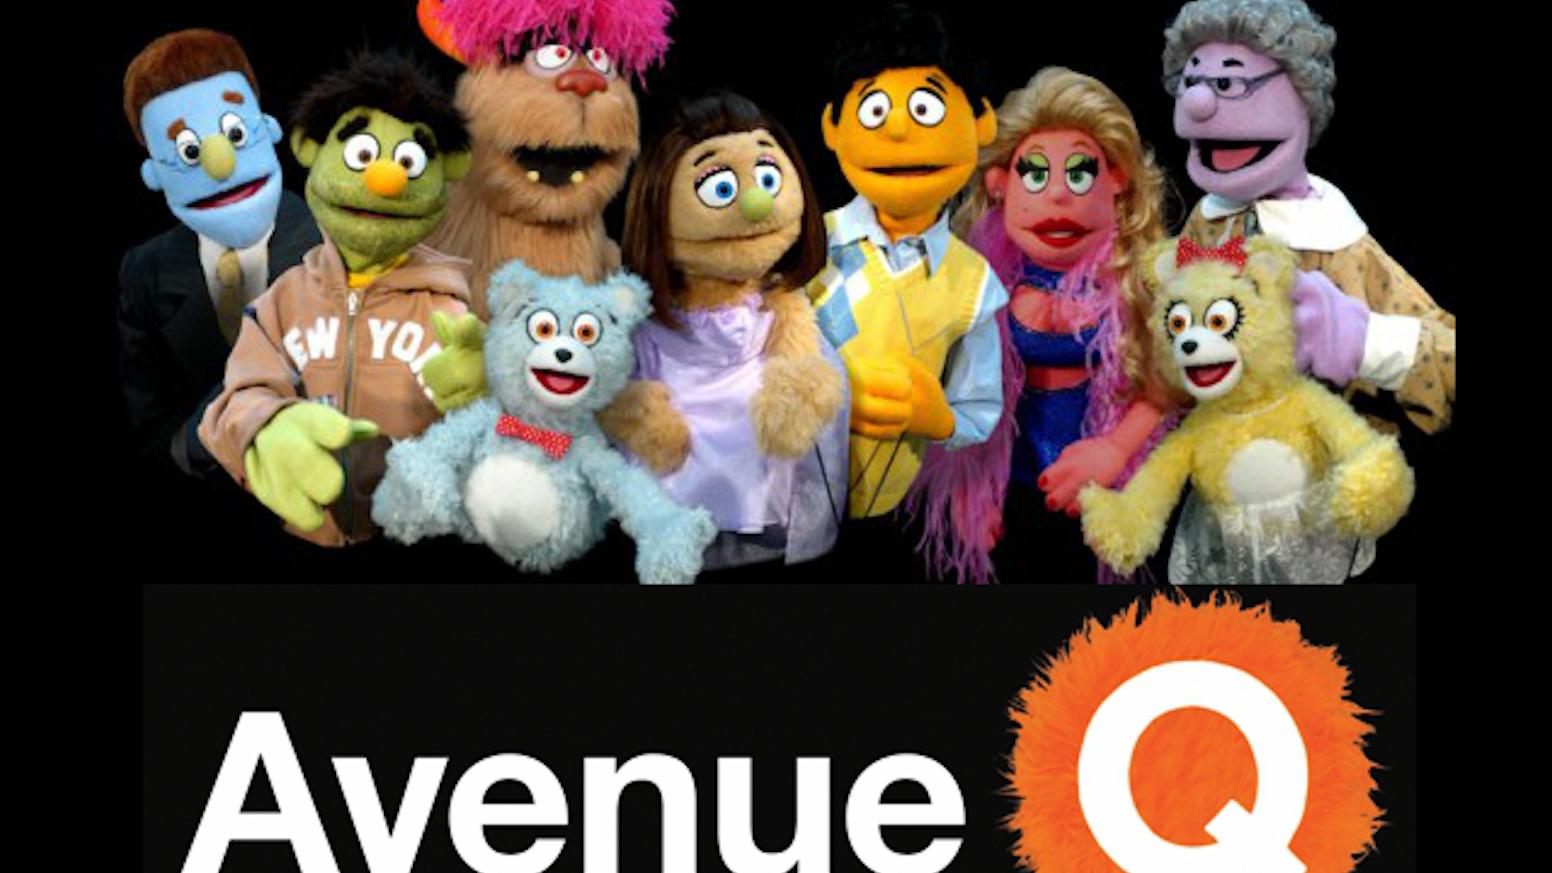 Avenue Q puppet rentals | Music Theatre International